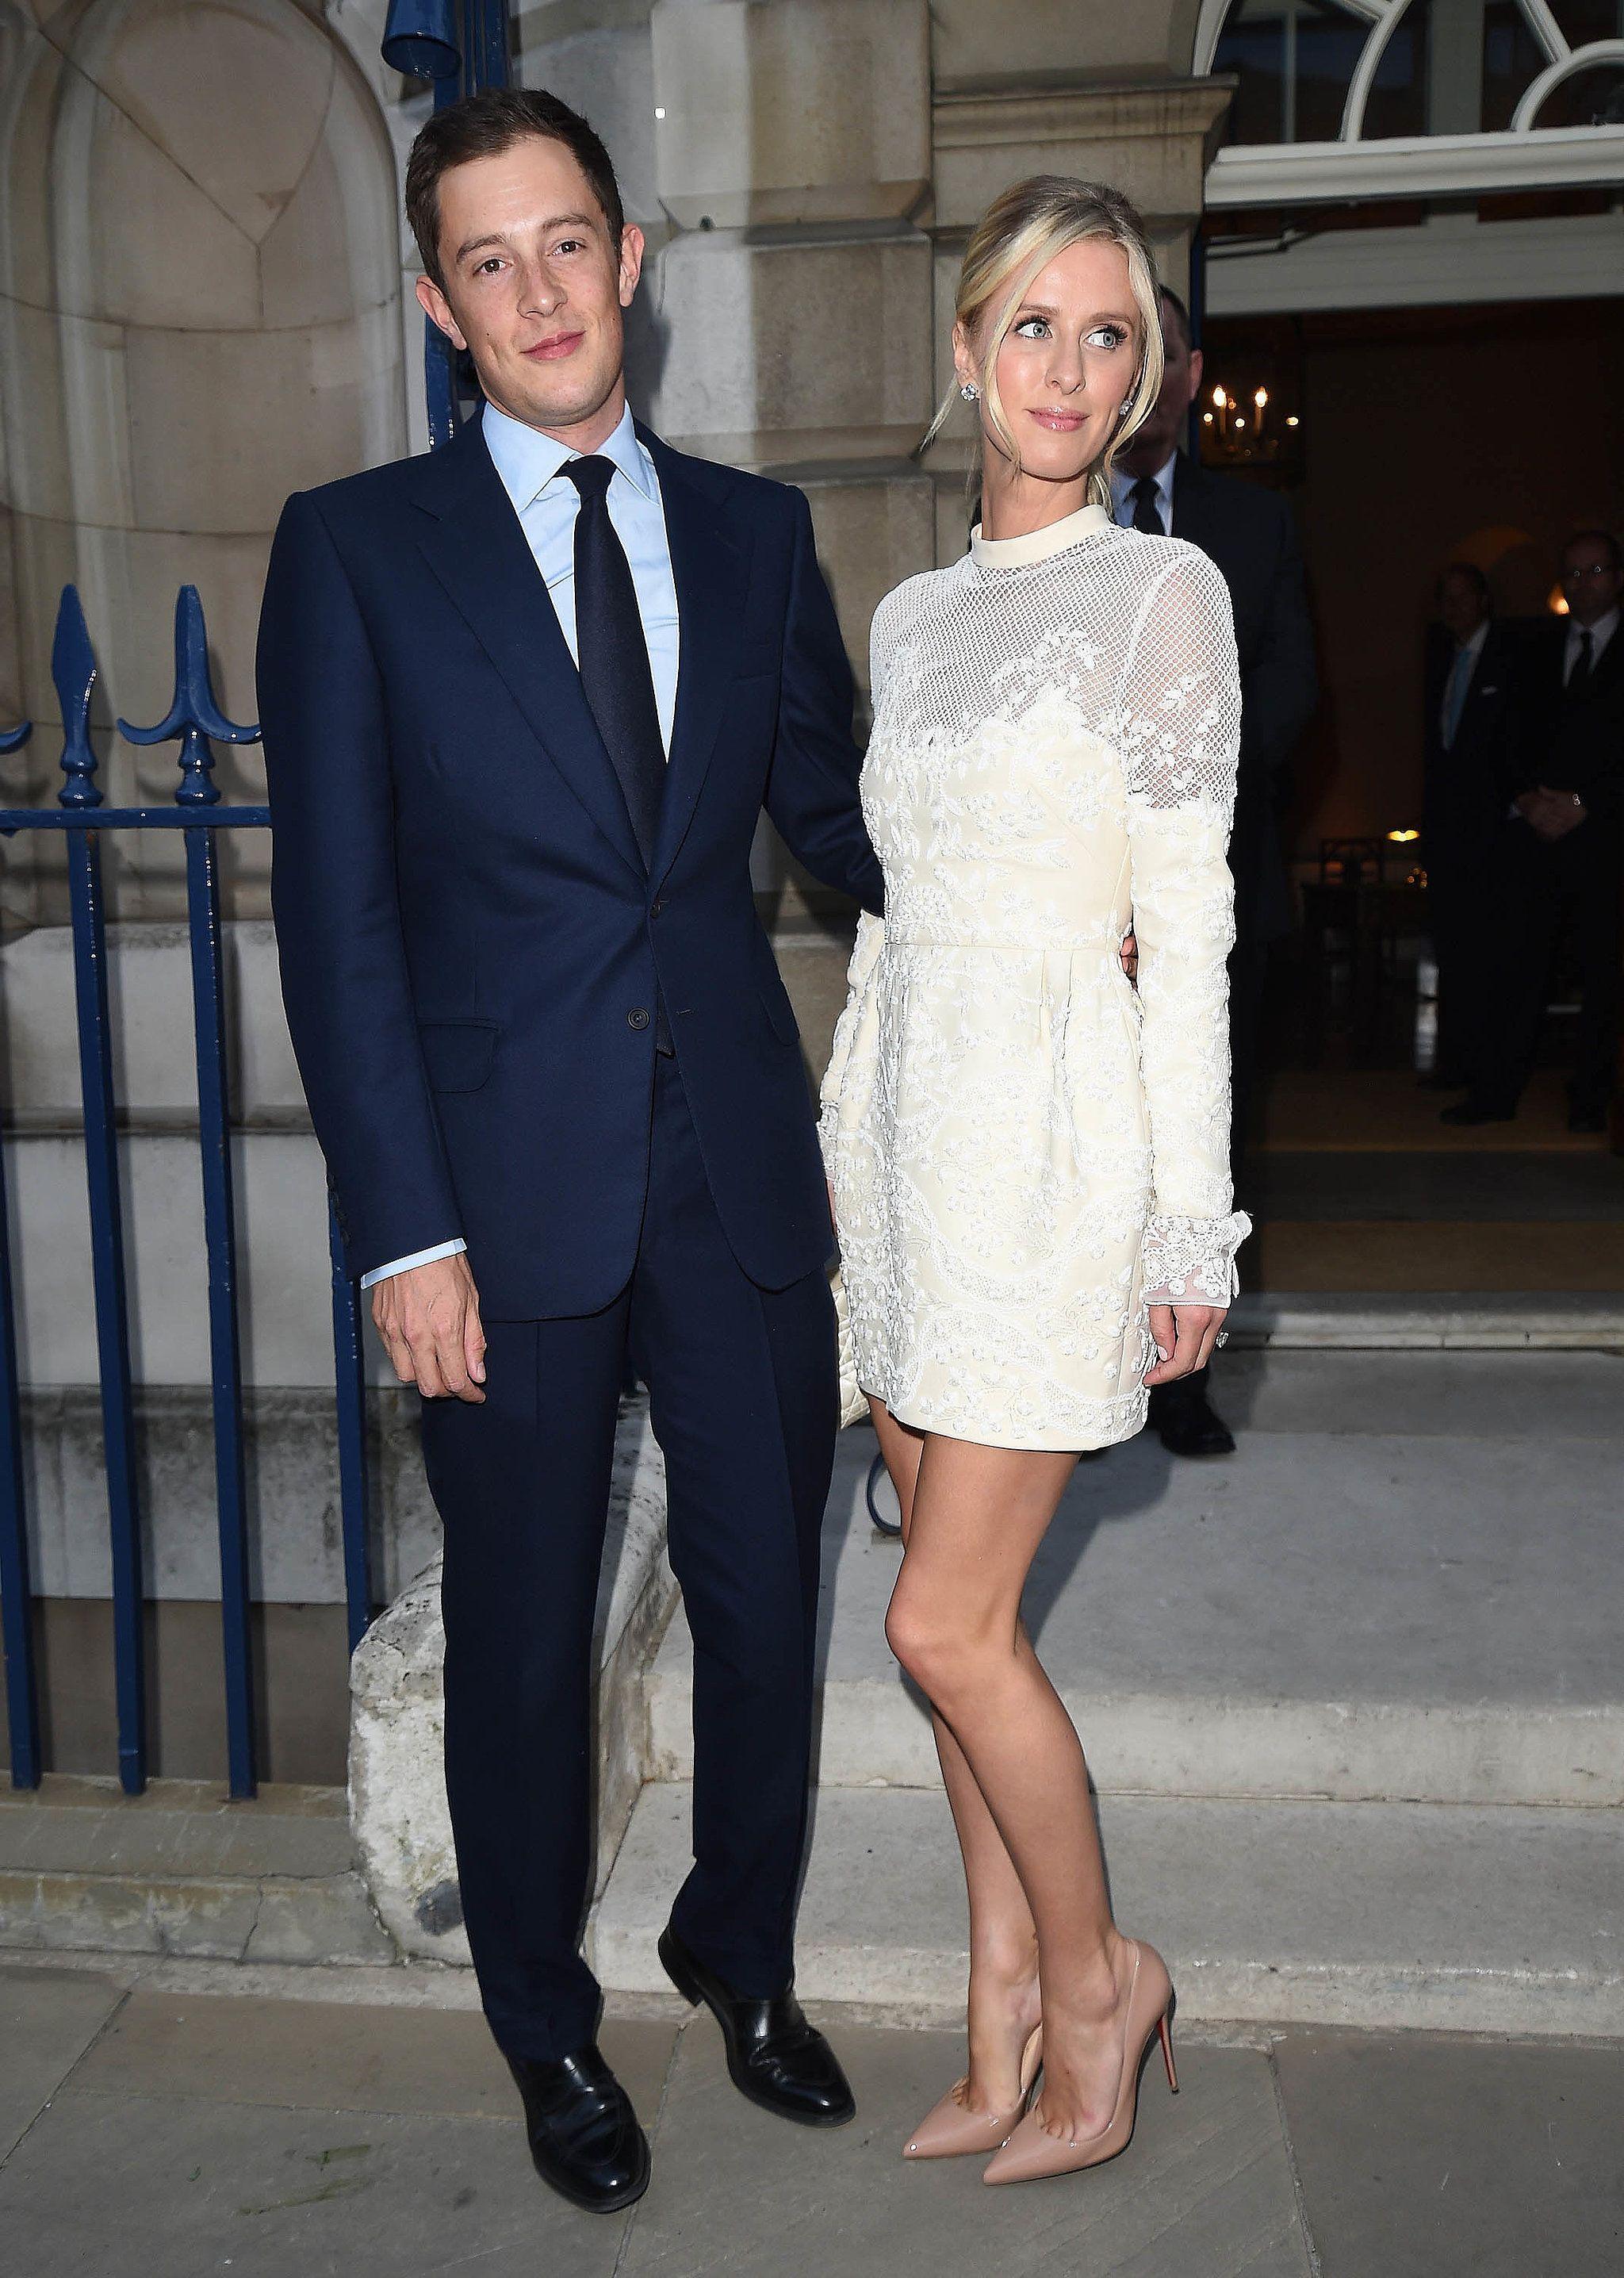 Nicky hilton and her fiancé step out for a prewedding dinner nicky